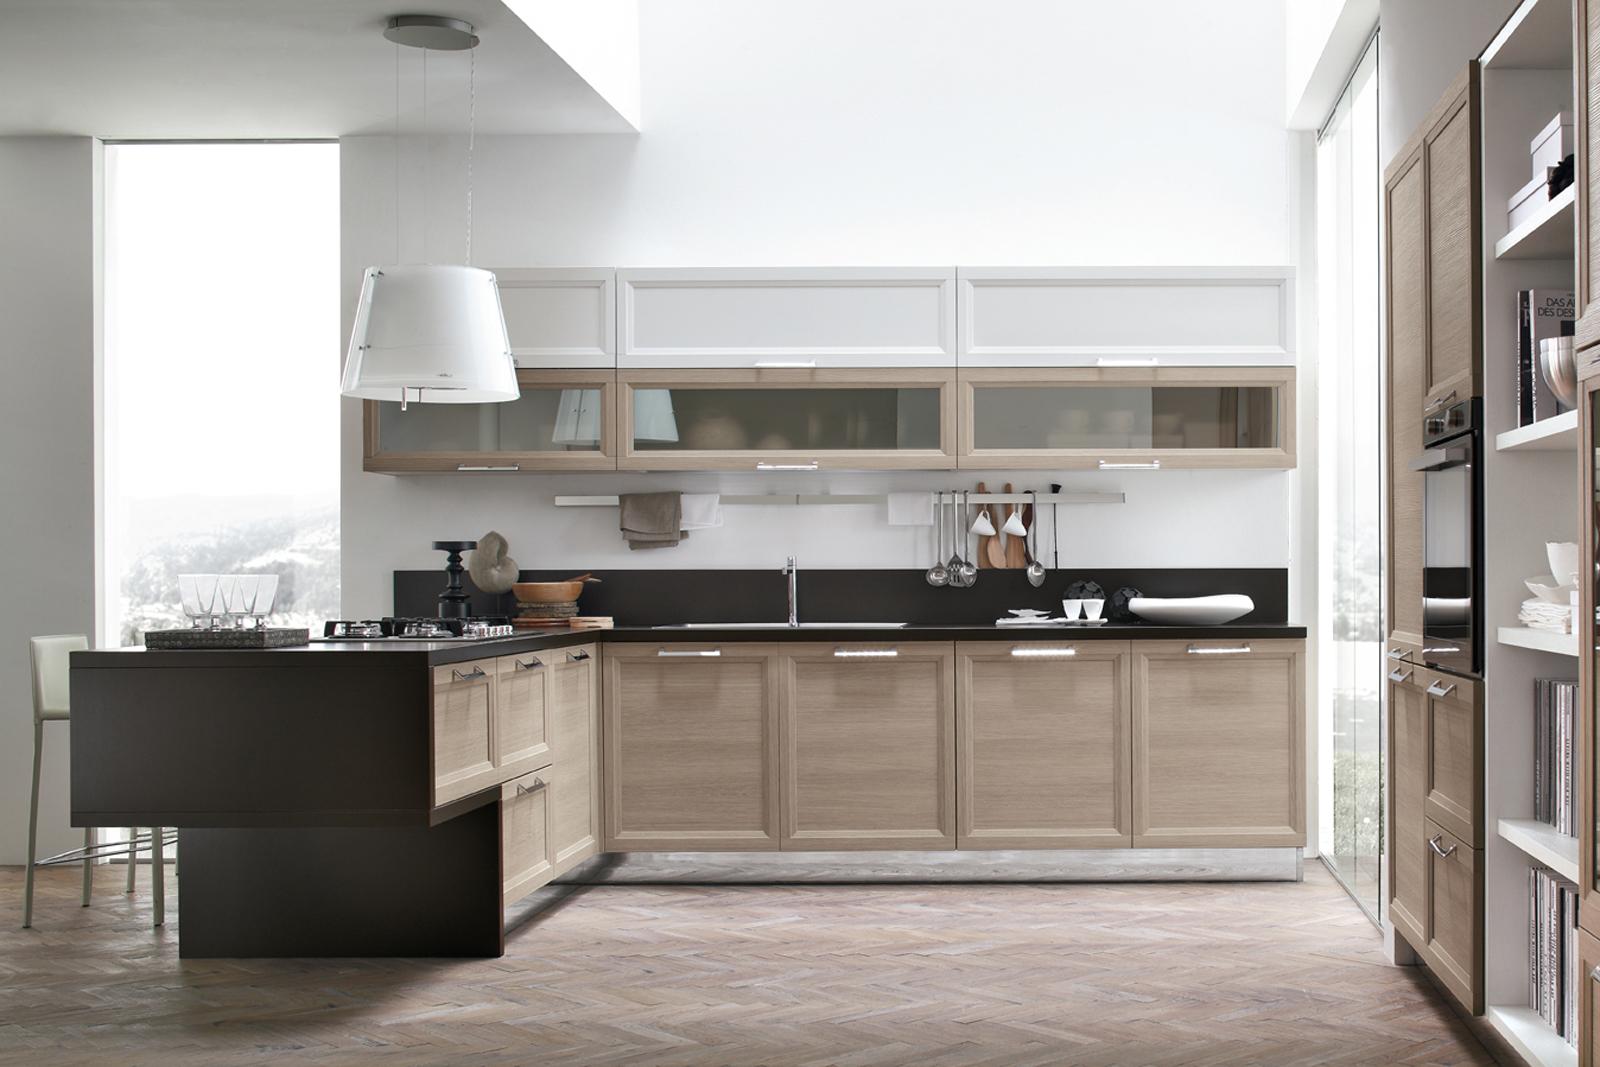 Cucina stosa malib lorenzelli arredamenti for Disegni di grandi cucine